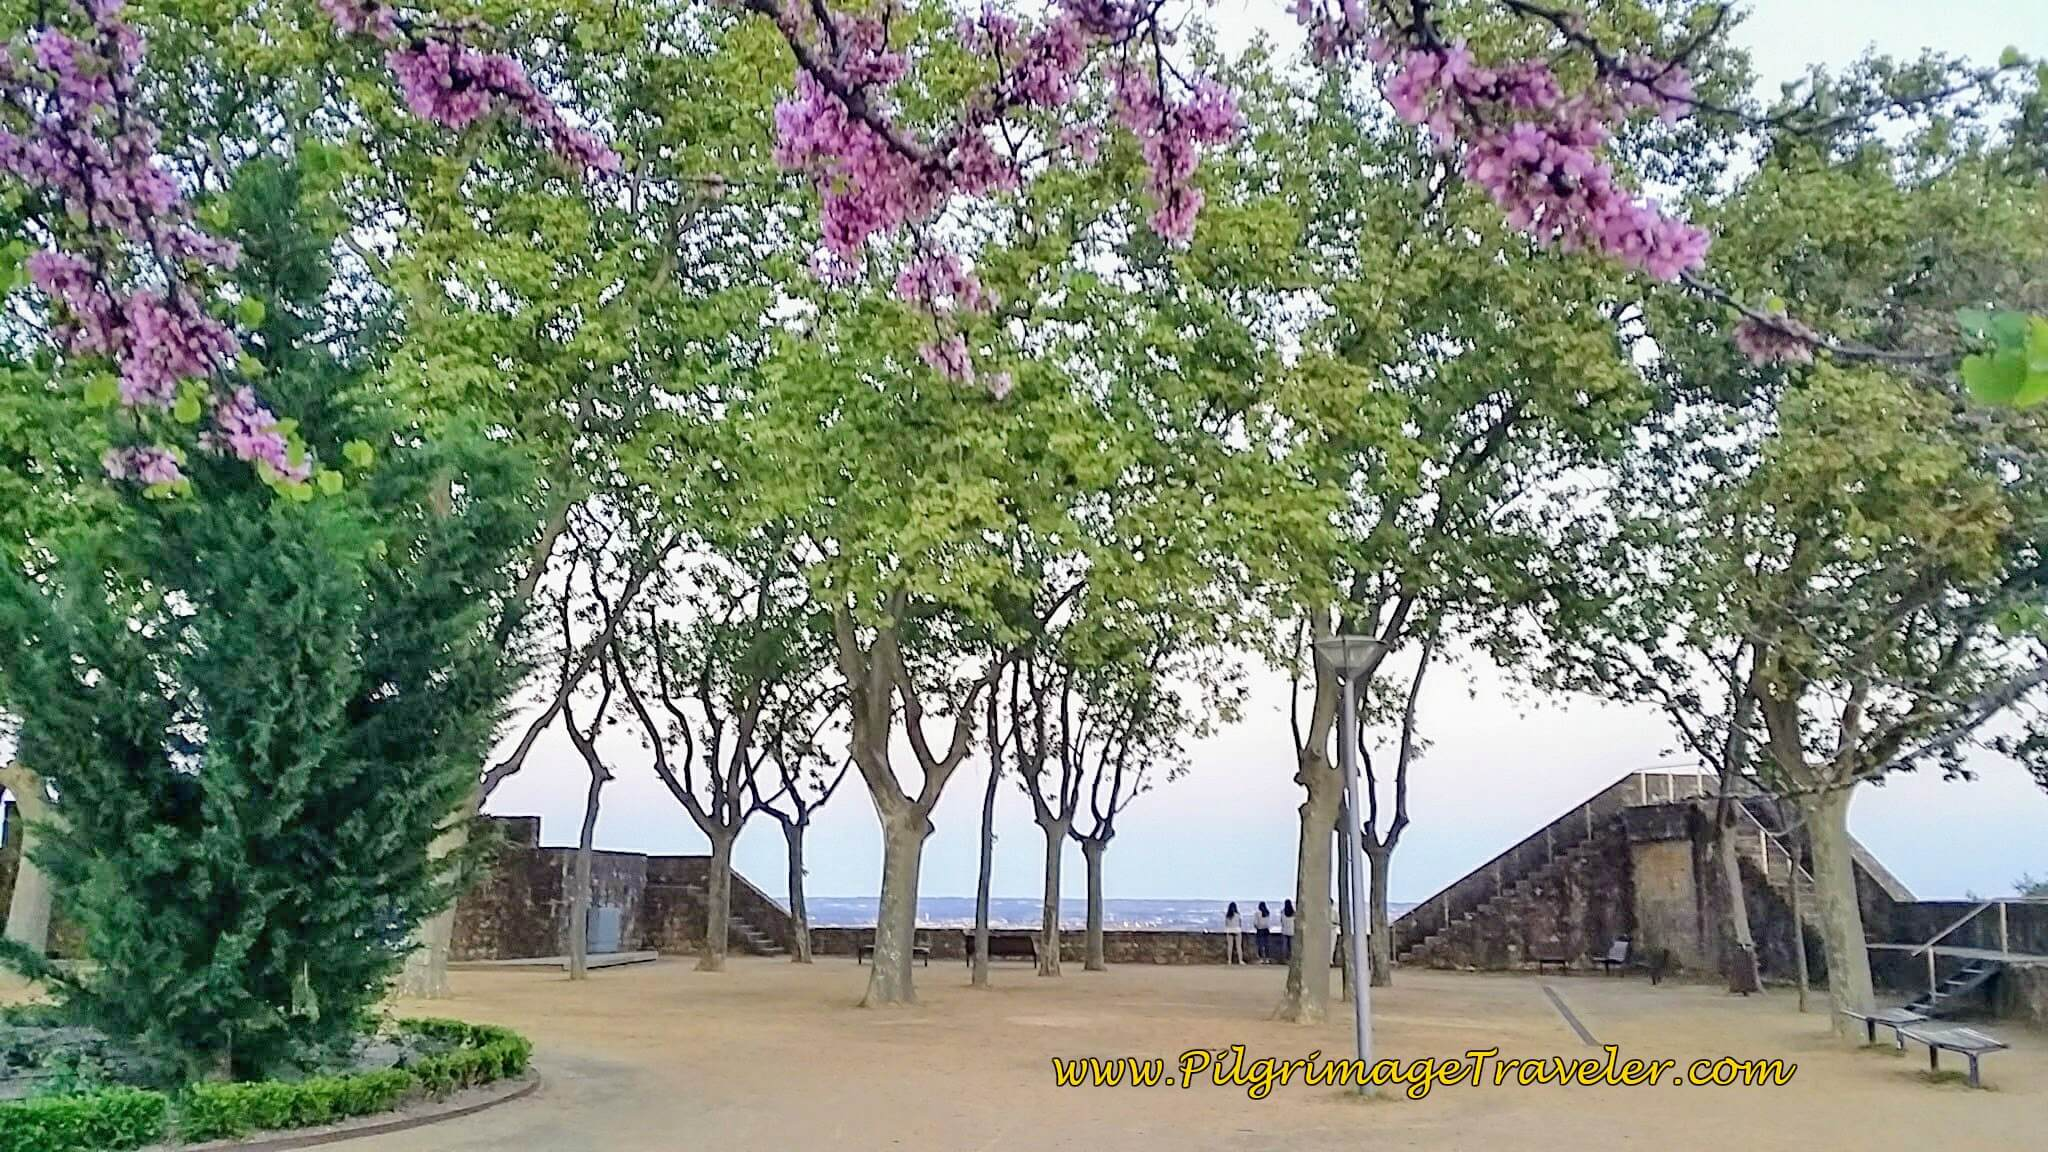 Garden of the Doors to the Sun, Santarém, Portugal